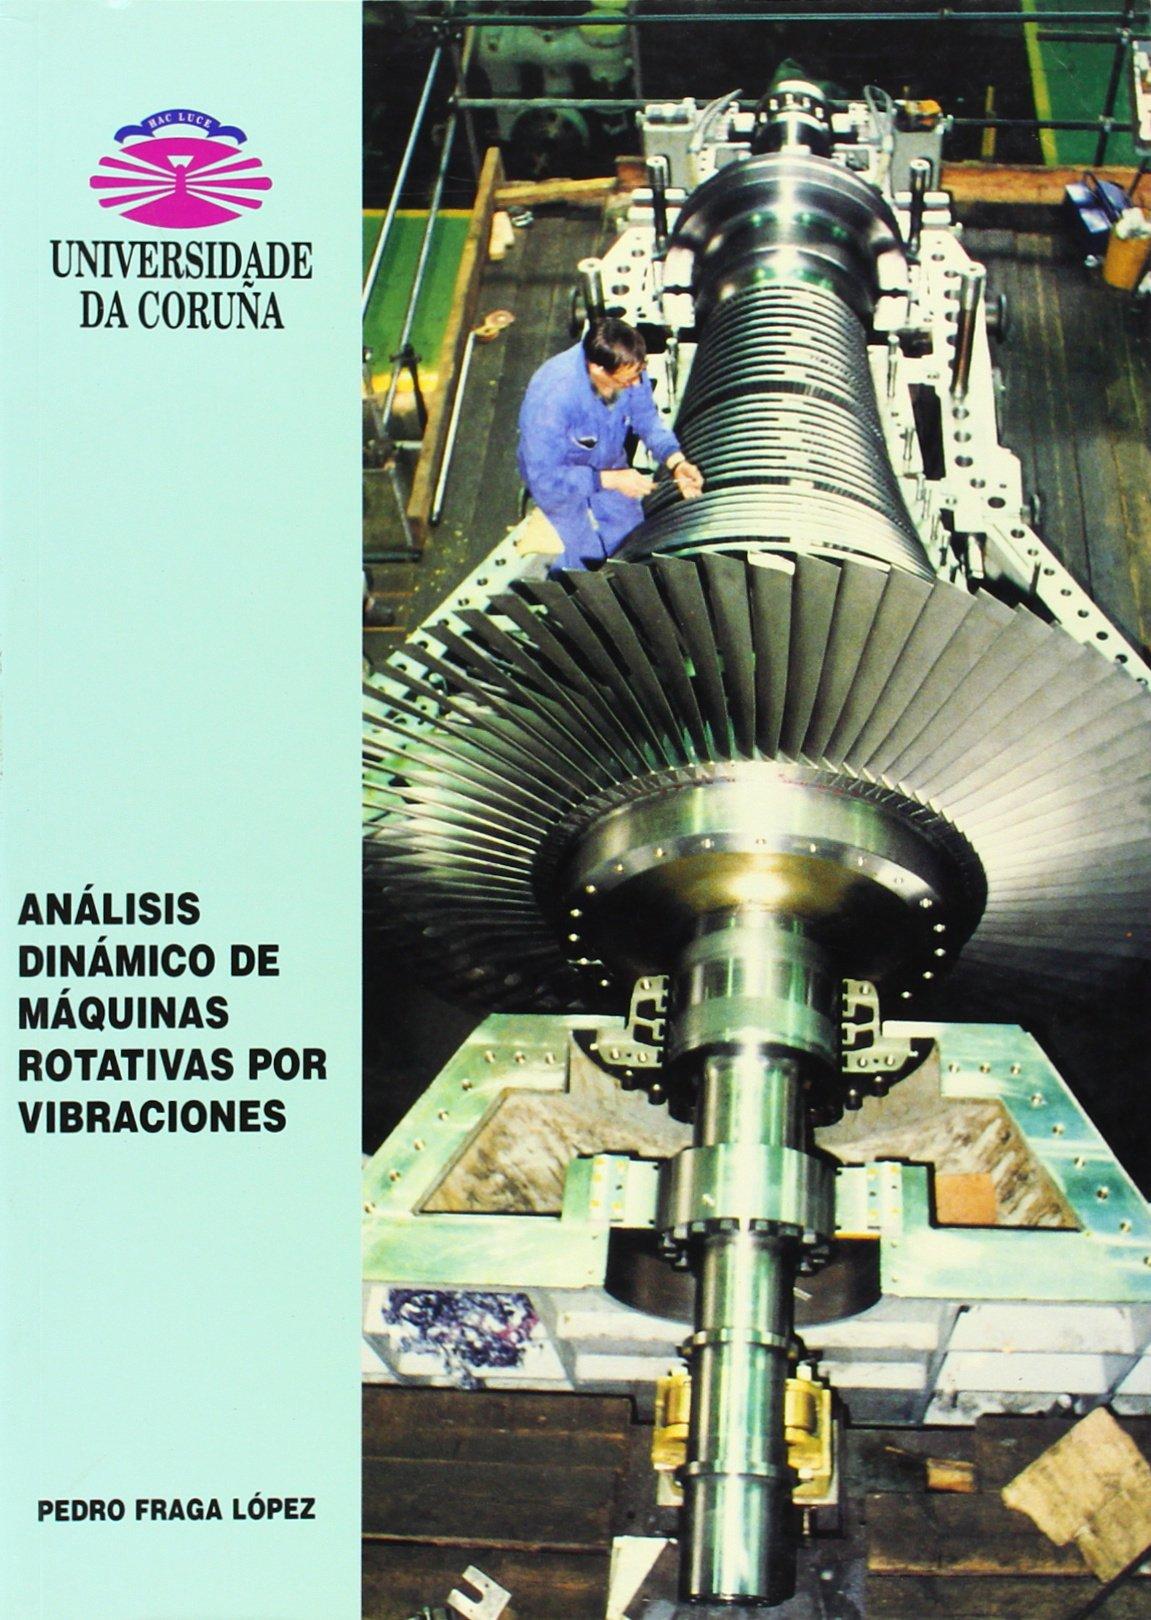 Amazon.com: Analisis dinamico de maquinas rotativas por ...